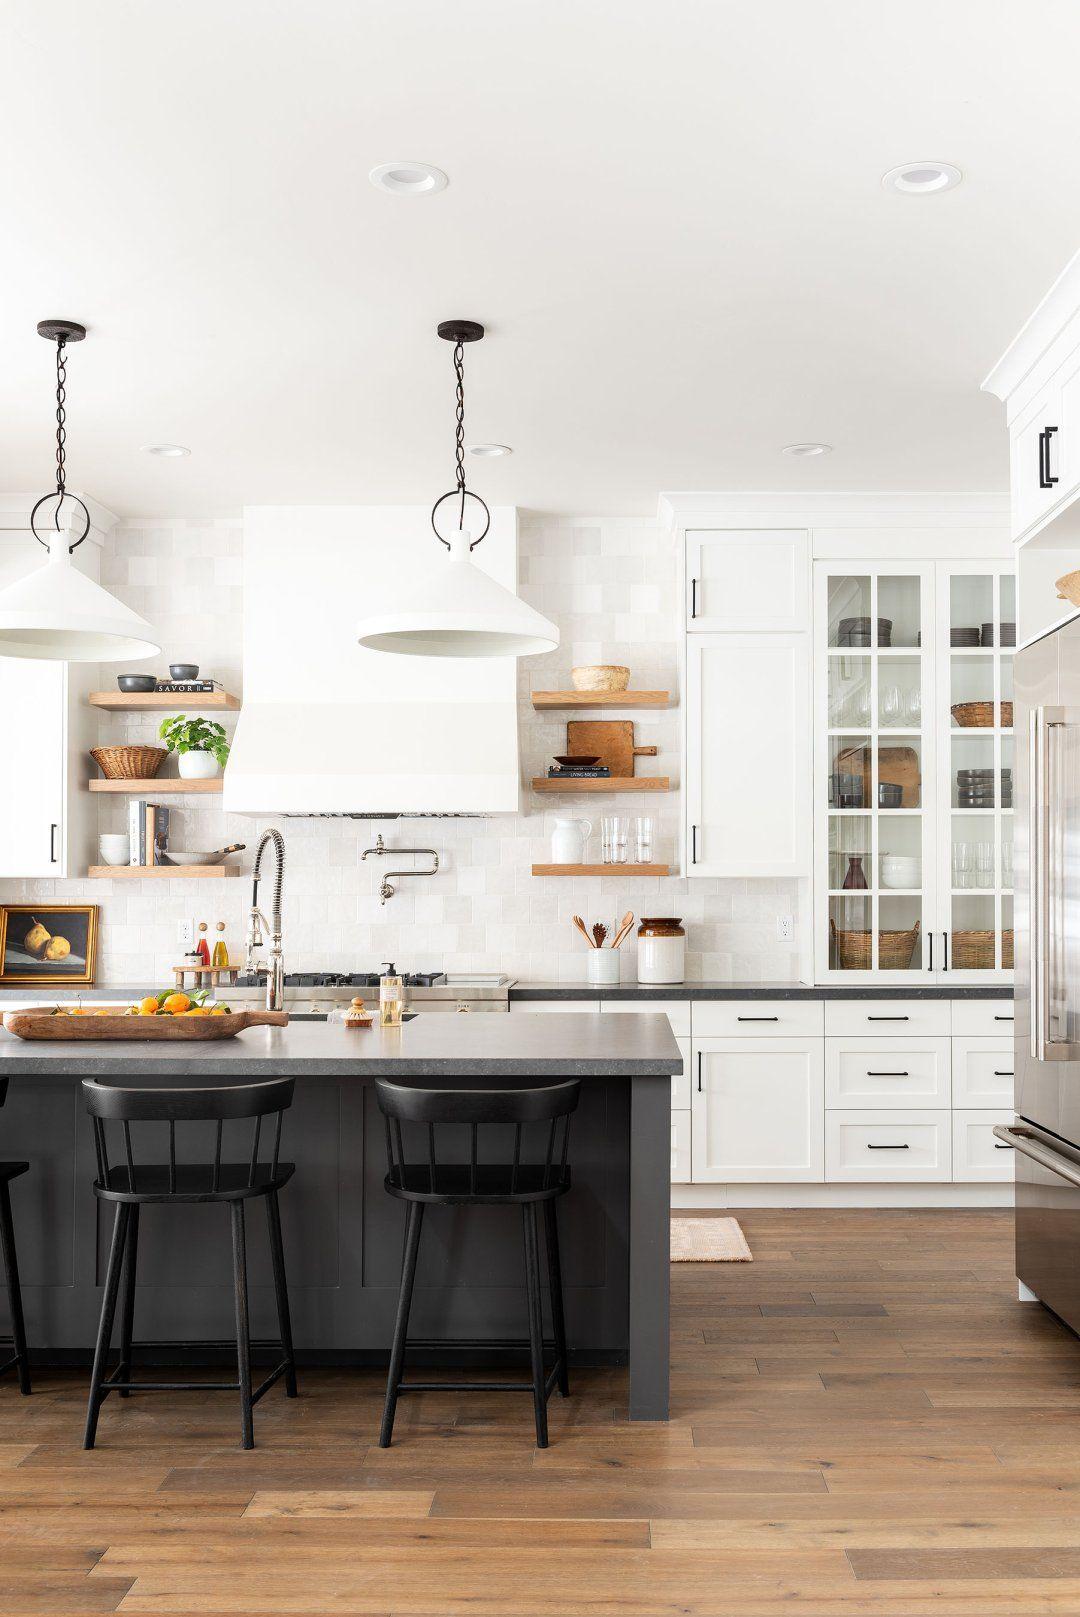 Black & White Transitional Kitchen in 2020 Latest